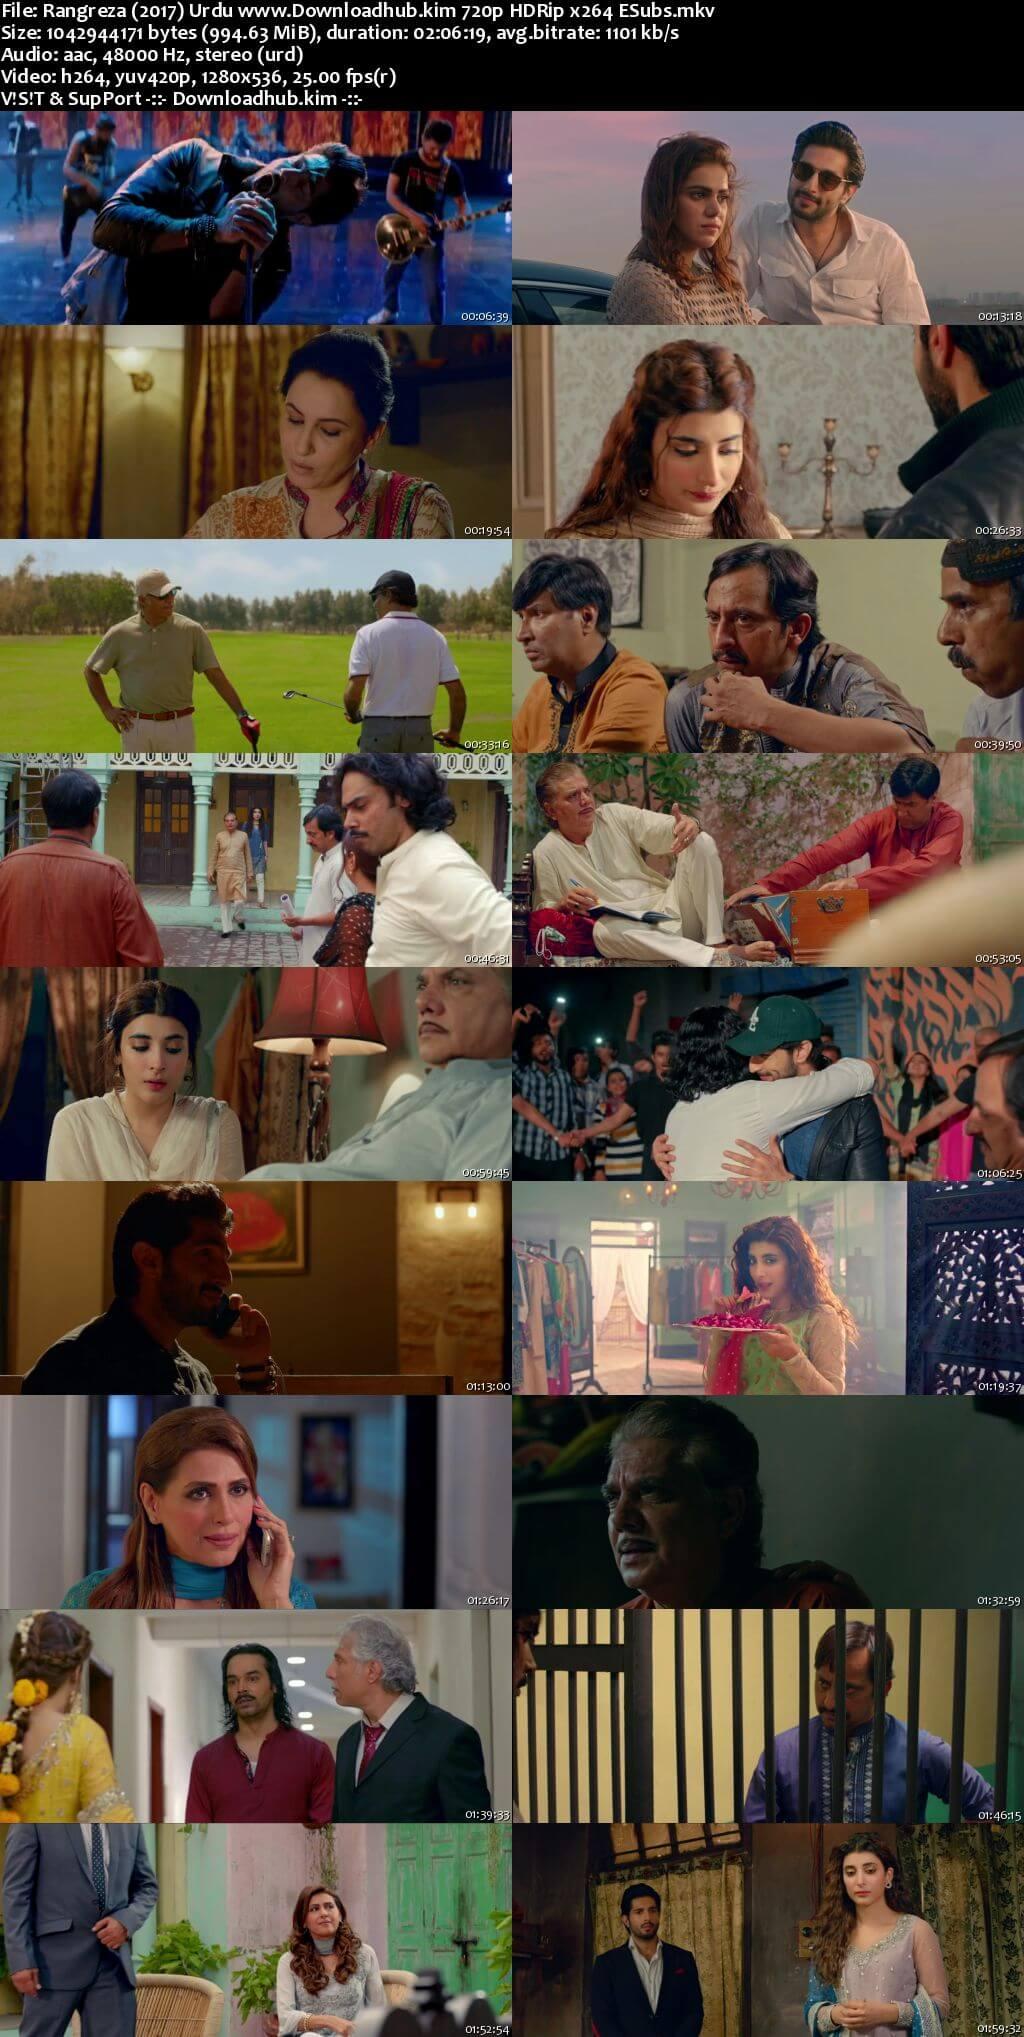 Rangreza 2017 Urdu 720p HDRip ESubs